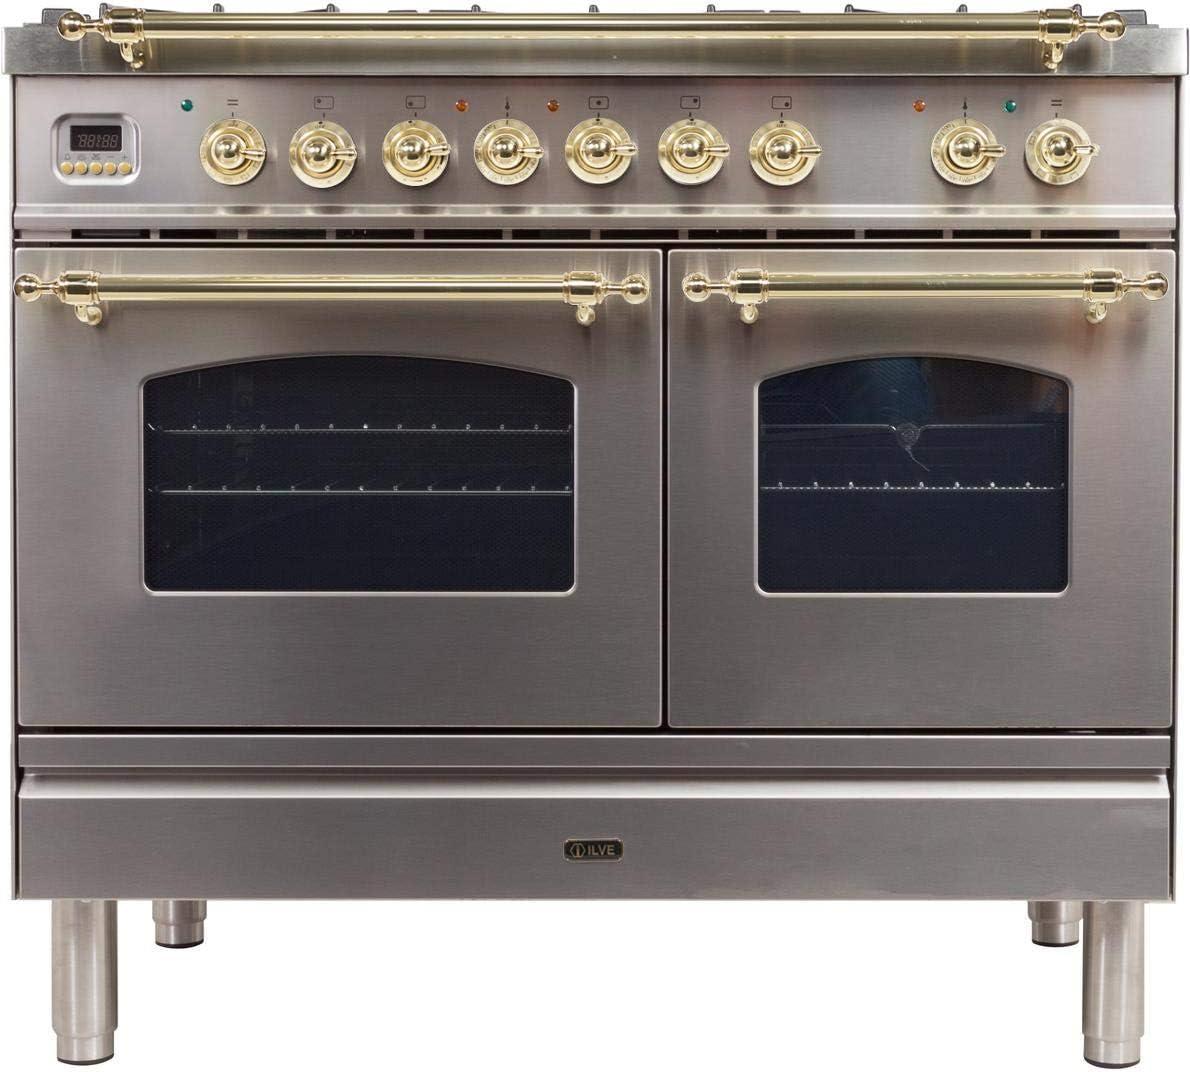 Ilve UPDN100FDMPILP Nostalgie Series 40 Inch Dual Fuel Convection Freestanding Range